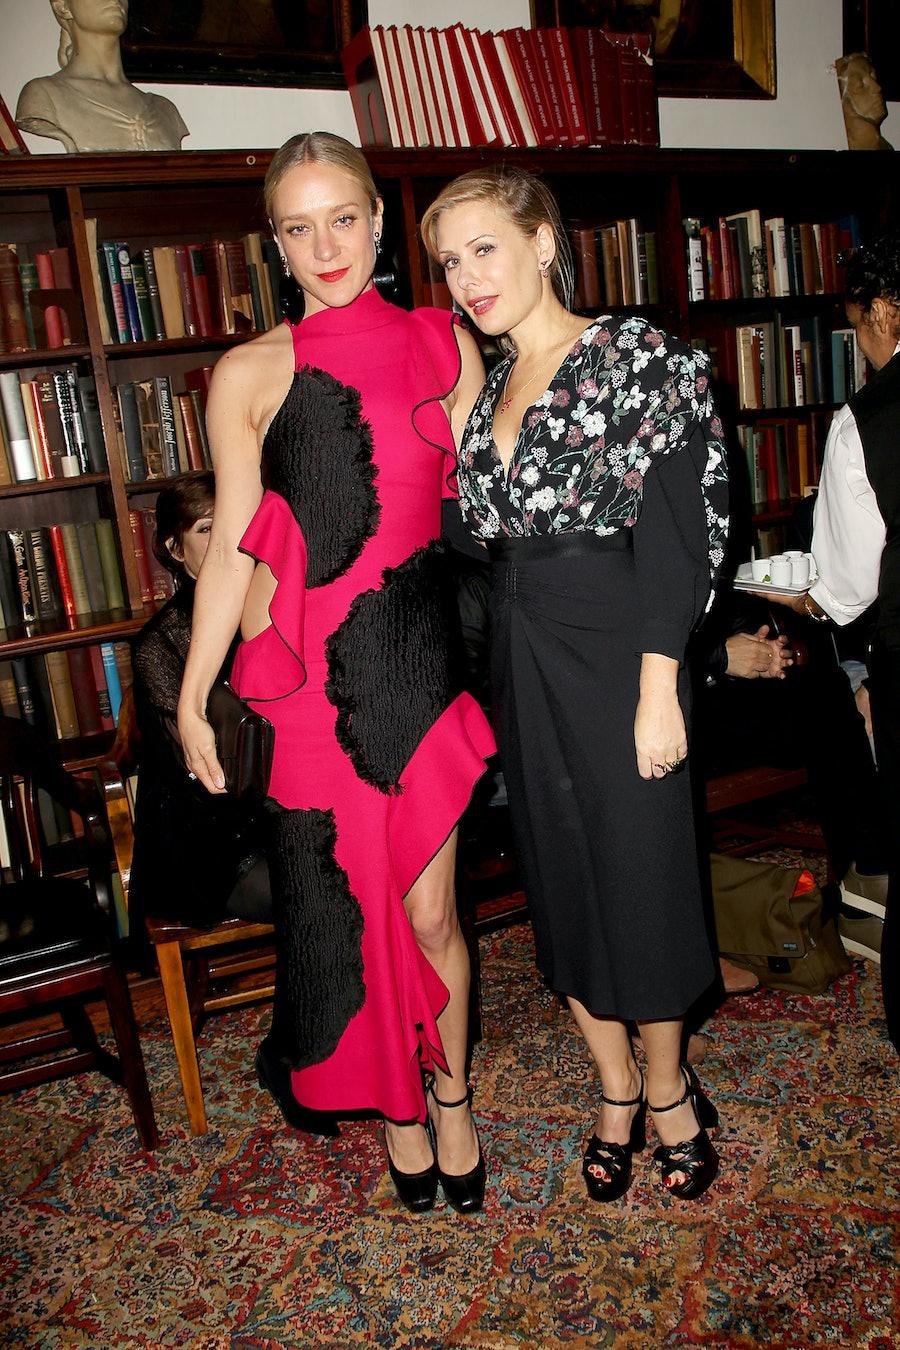 Chloe Sevigny and Tara Subkoff